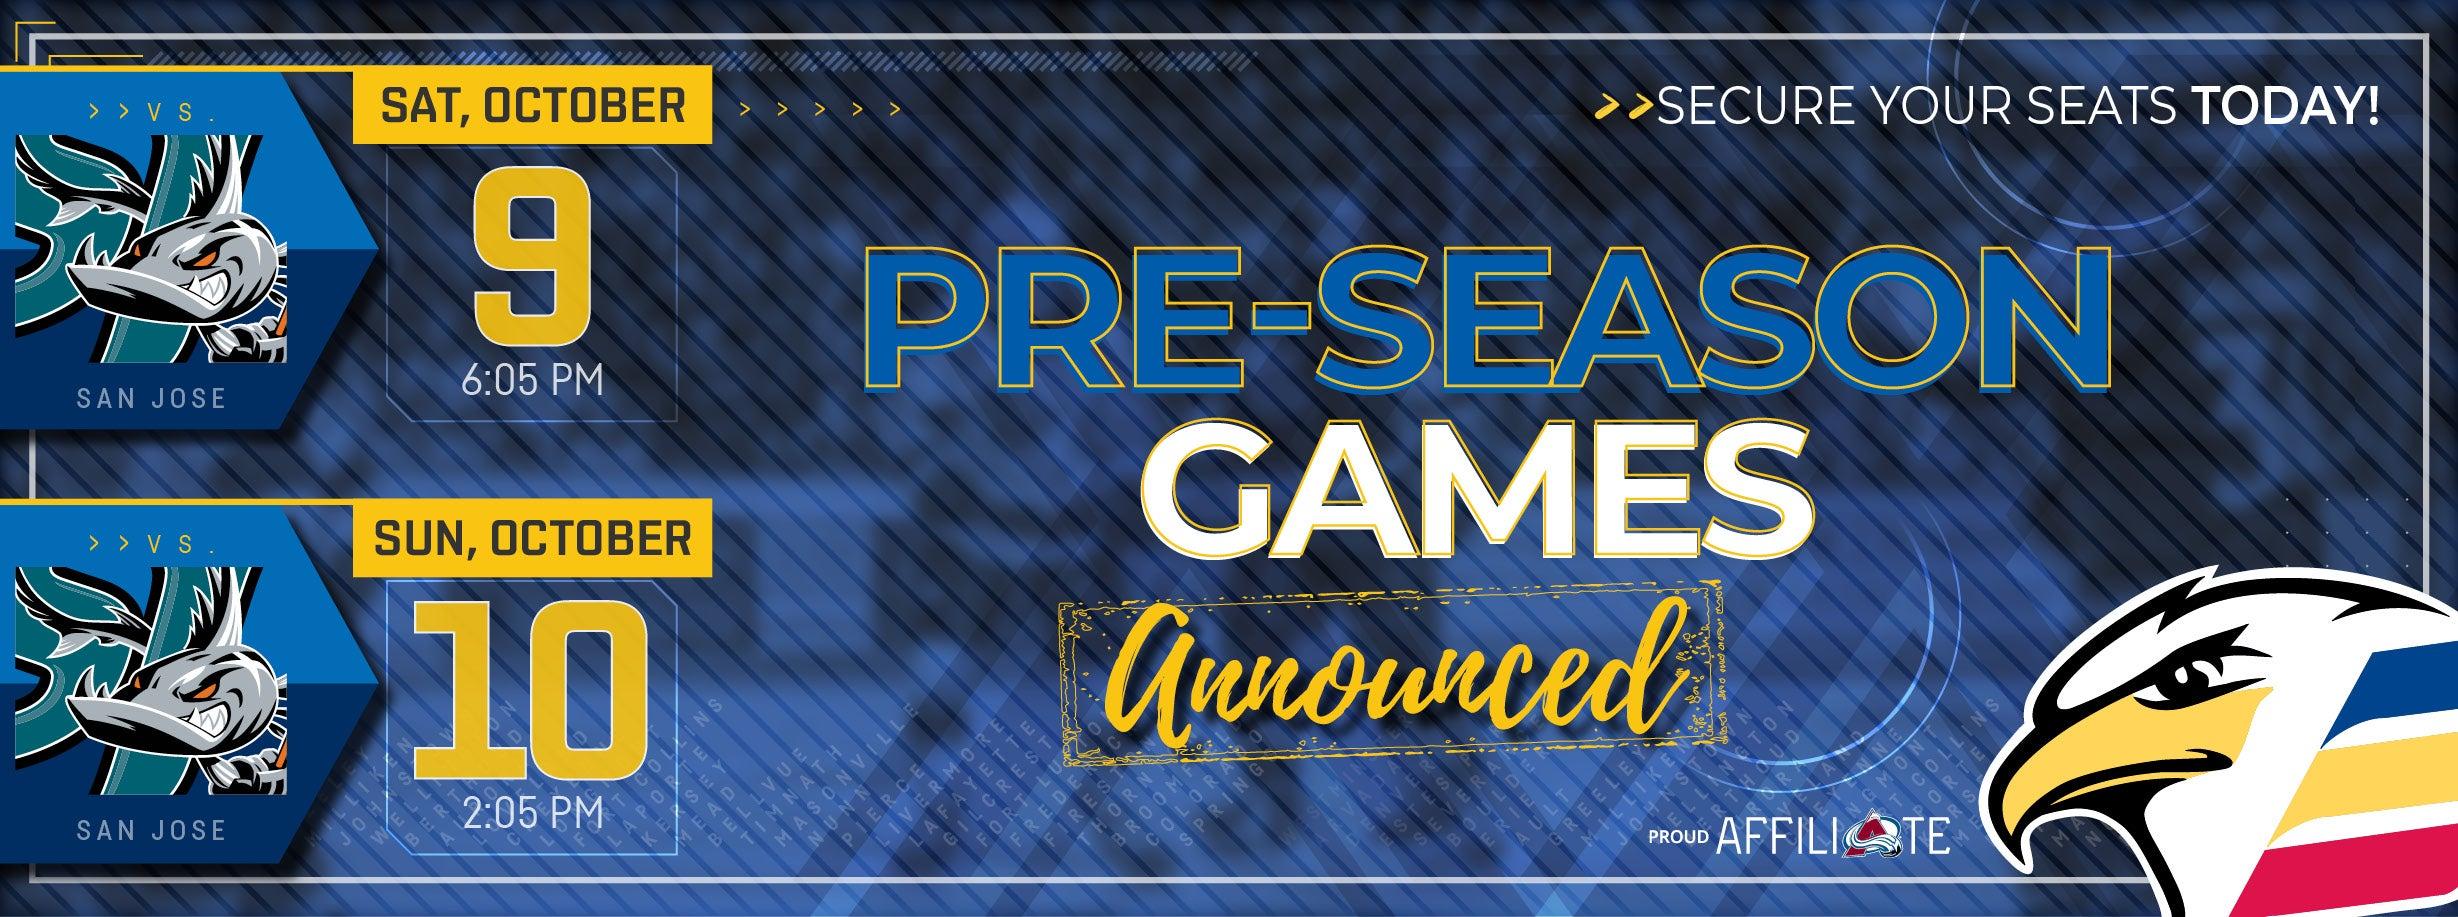 Colorado to Host San Jose in Pair of Preseason Games